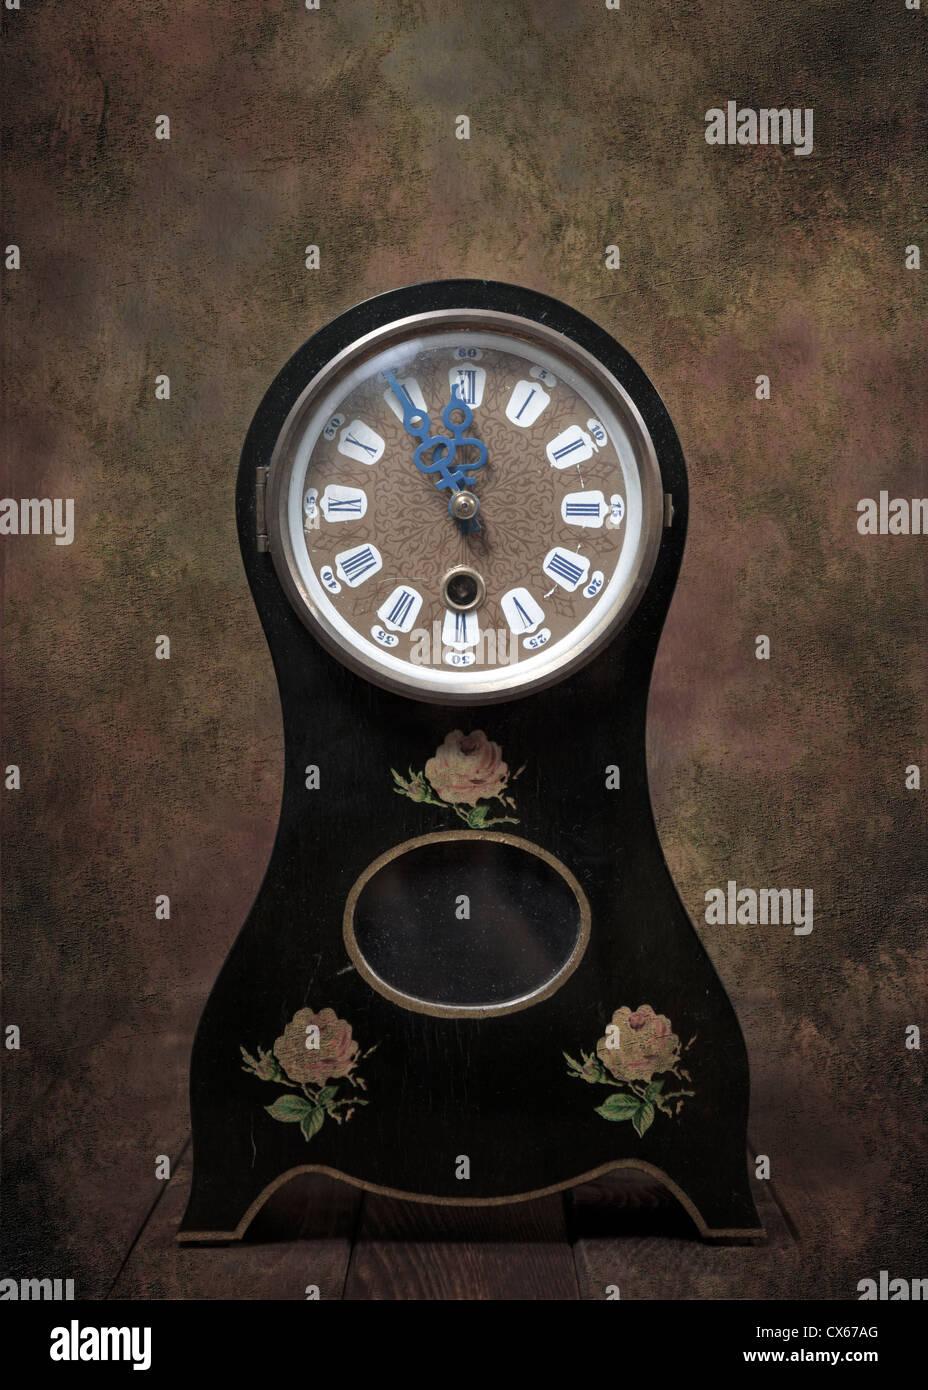 an old table clock in Biedermeier style - Stock Image